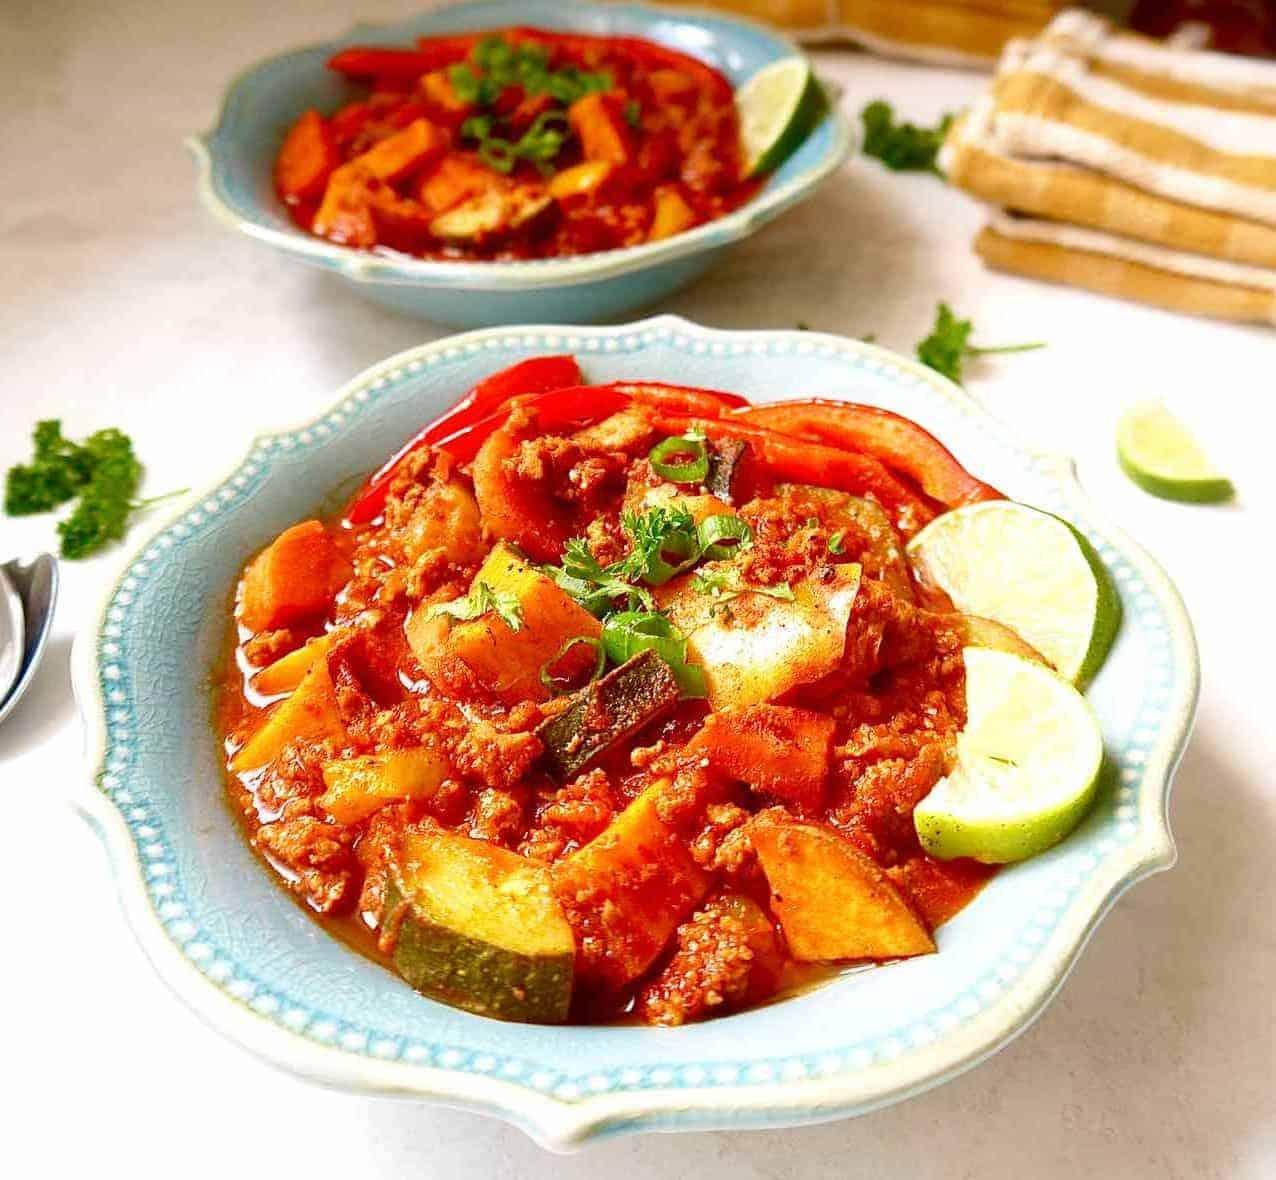 Paleo Ground Turkey Hot Sauce Chili Whole30 Gf Perchance To Cook